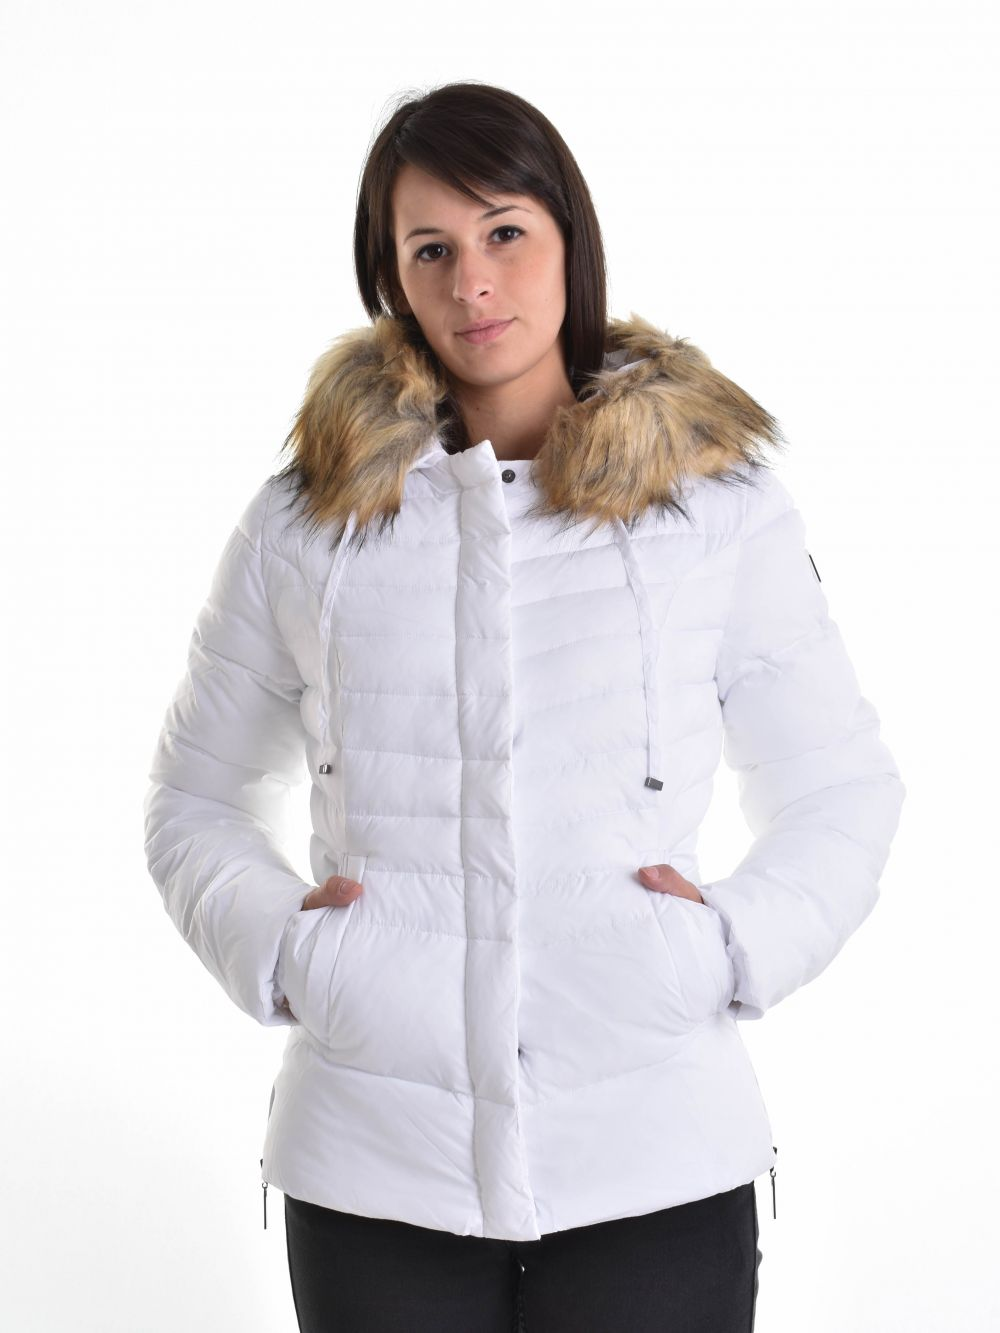 Mayo Chix női kabát ICE | Markasbolt.hu Hivatalos Mayo Chix